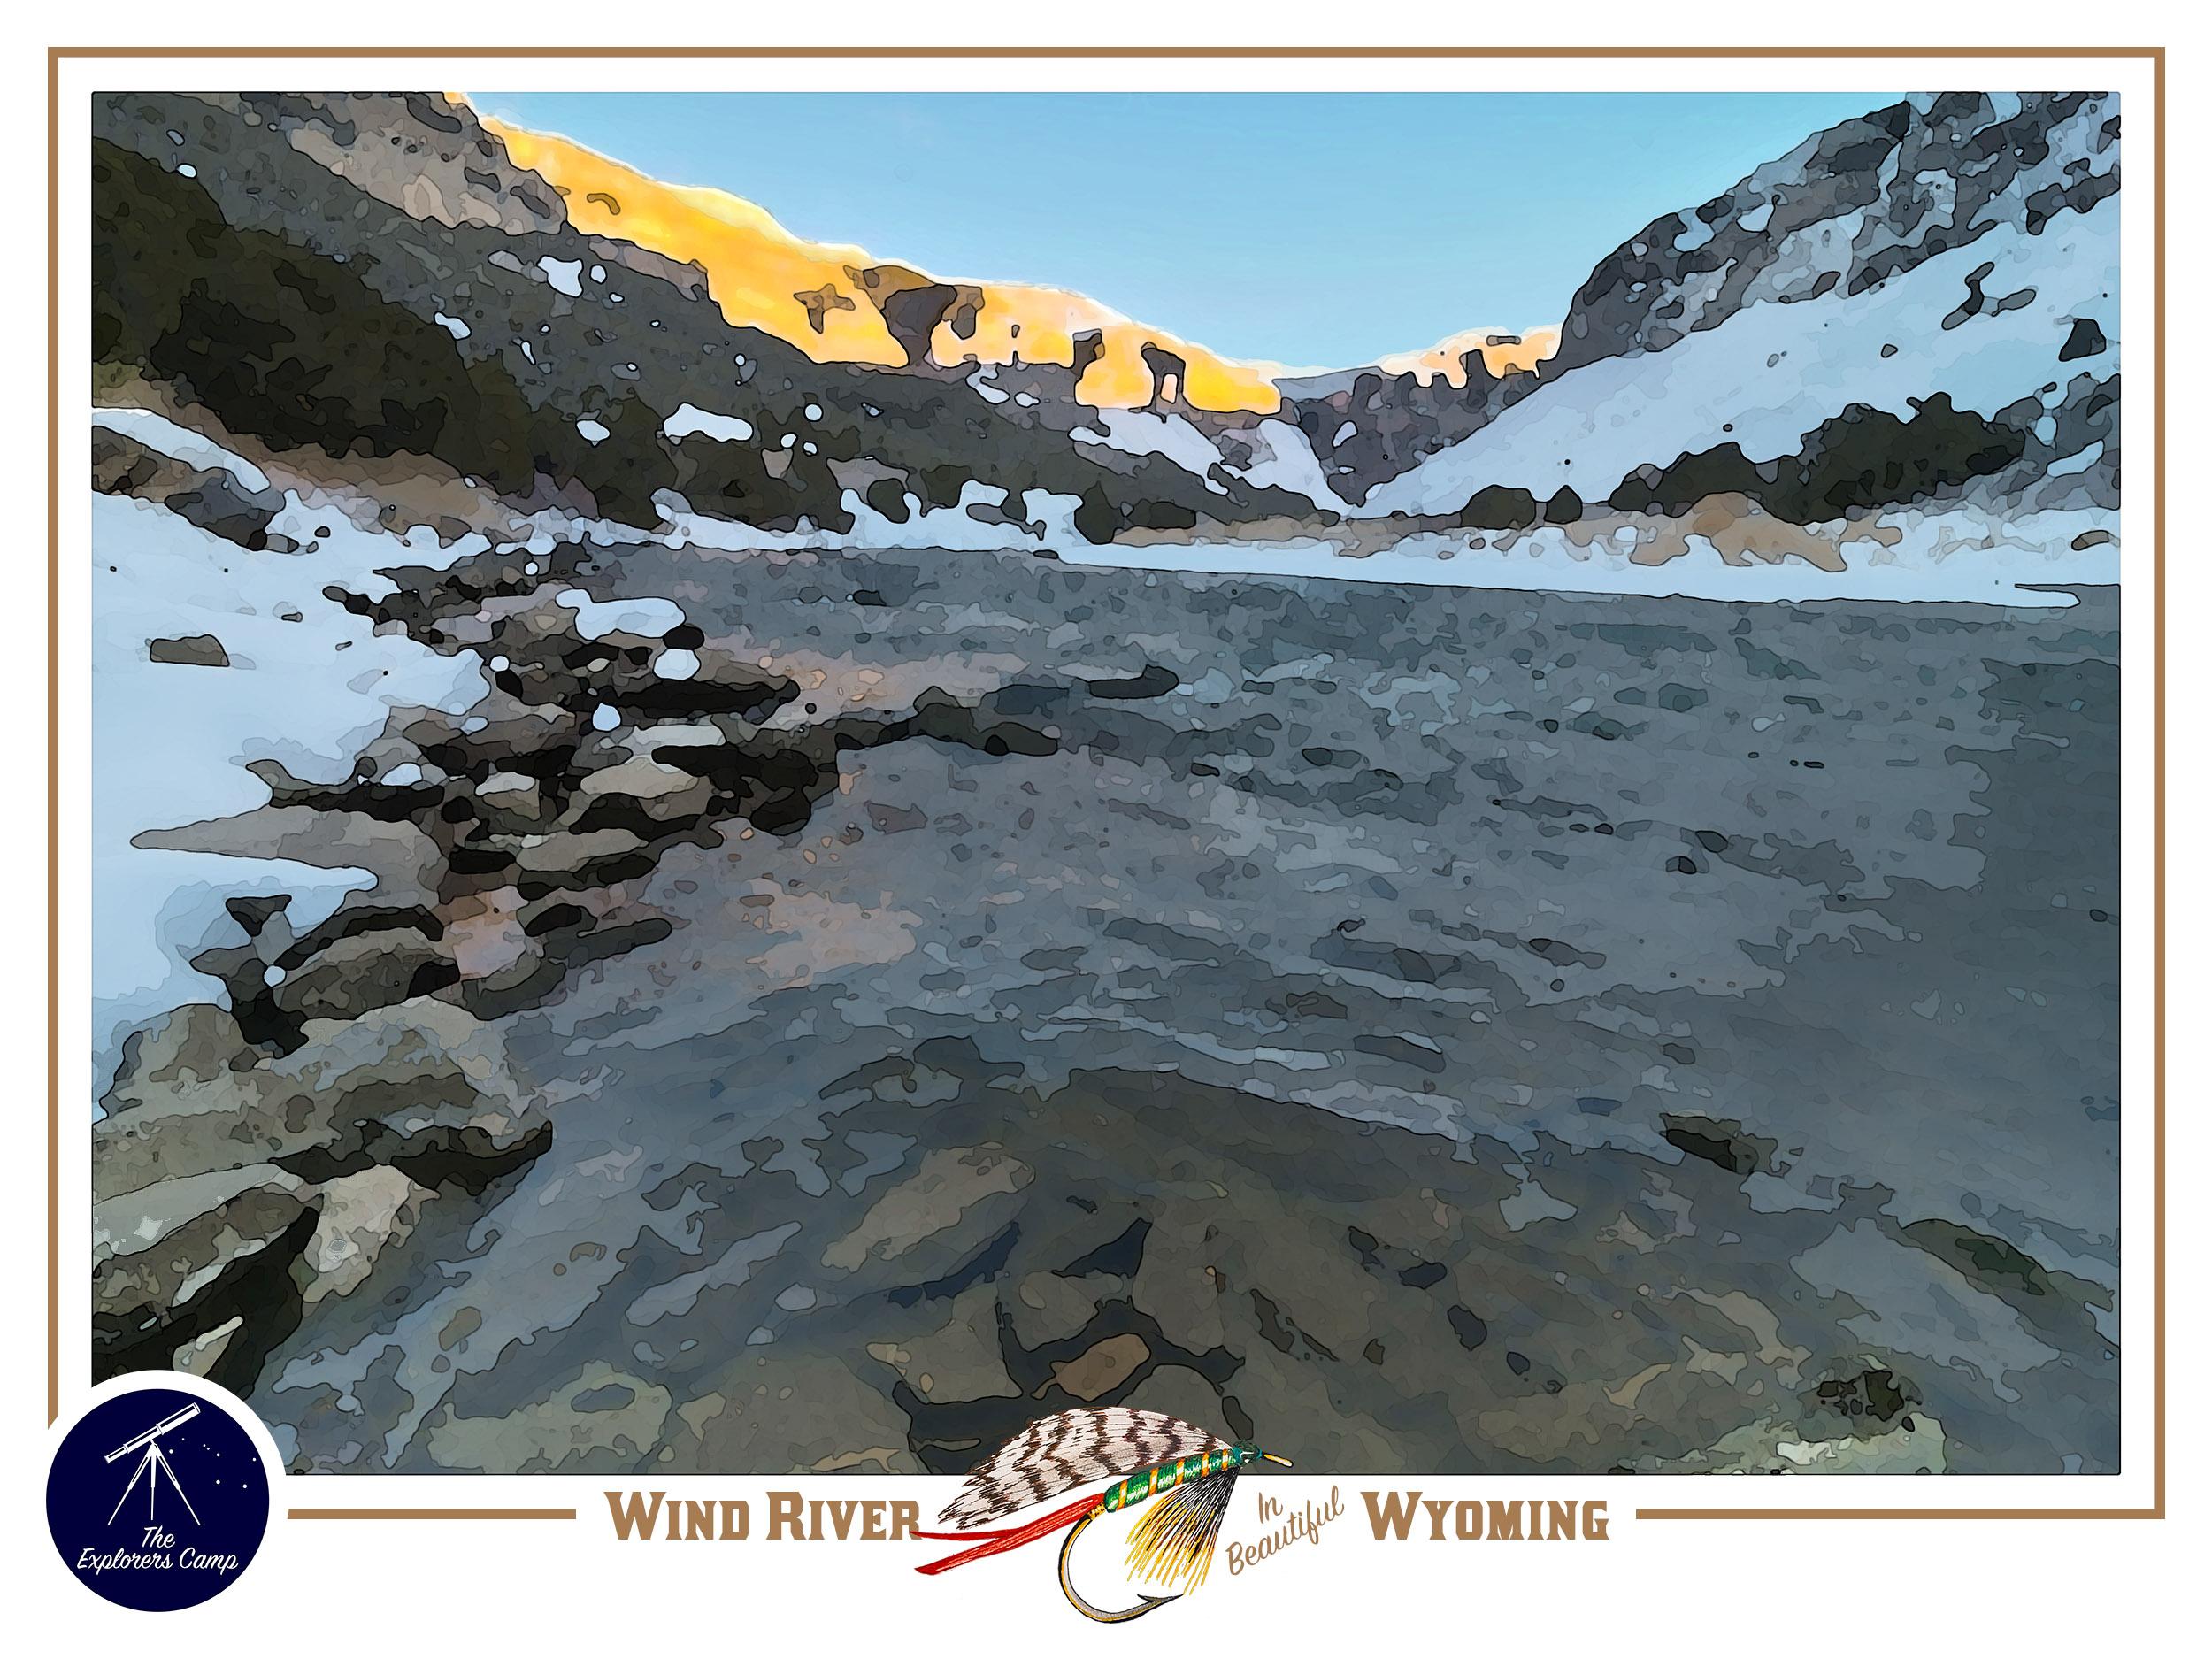 WindRiver18x24.jpg